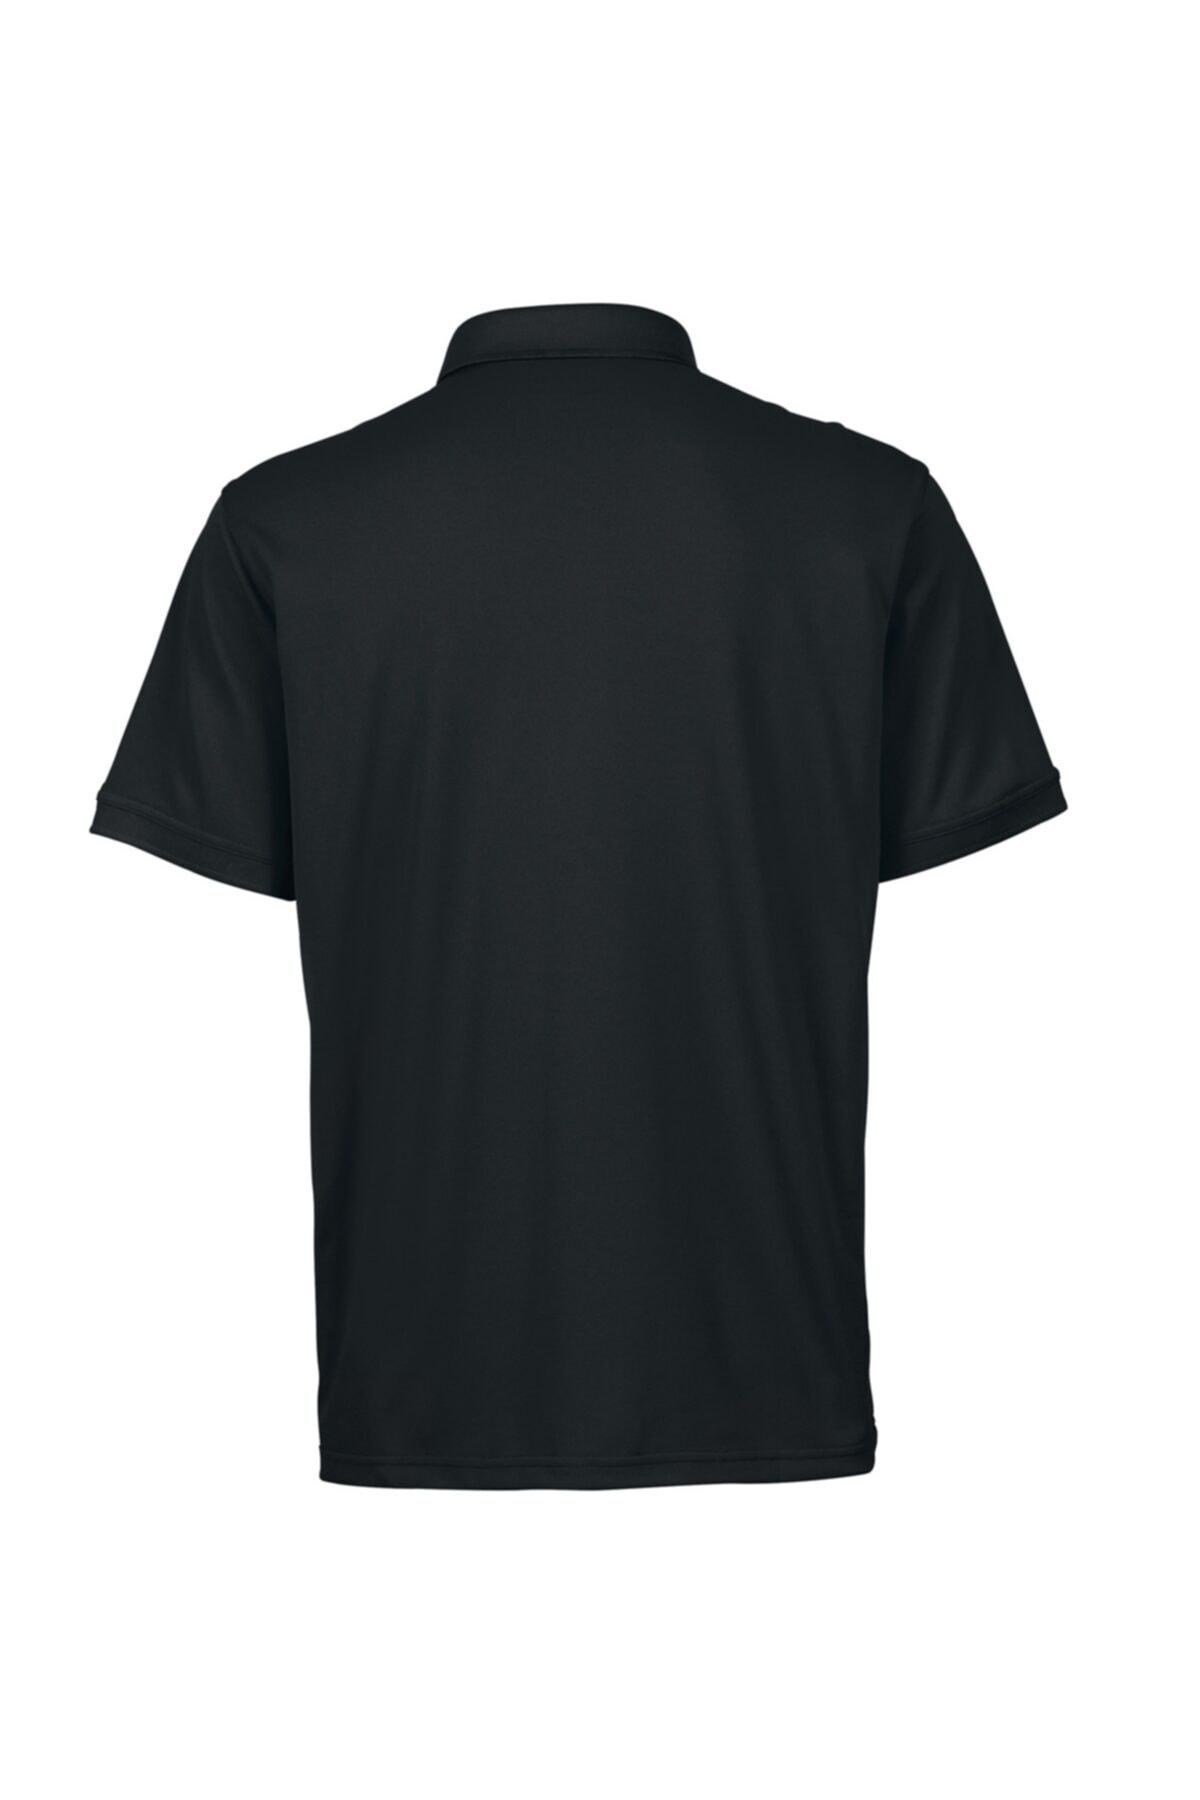 VAUDE Me Marwick Polo II T-Shirt 40034 2